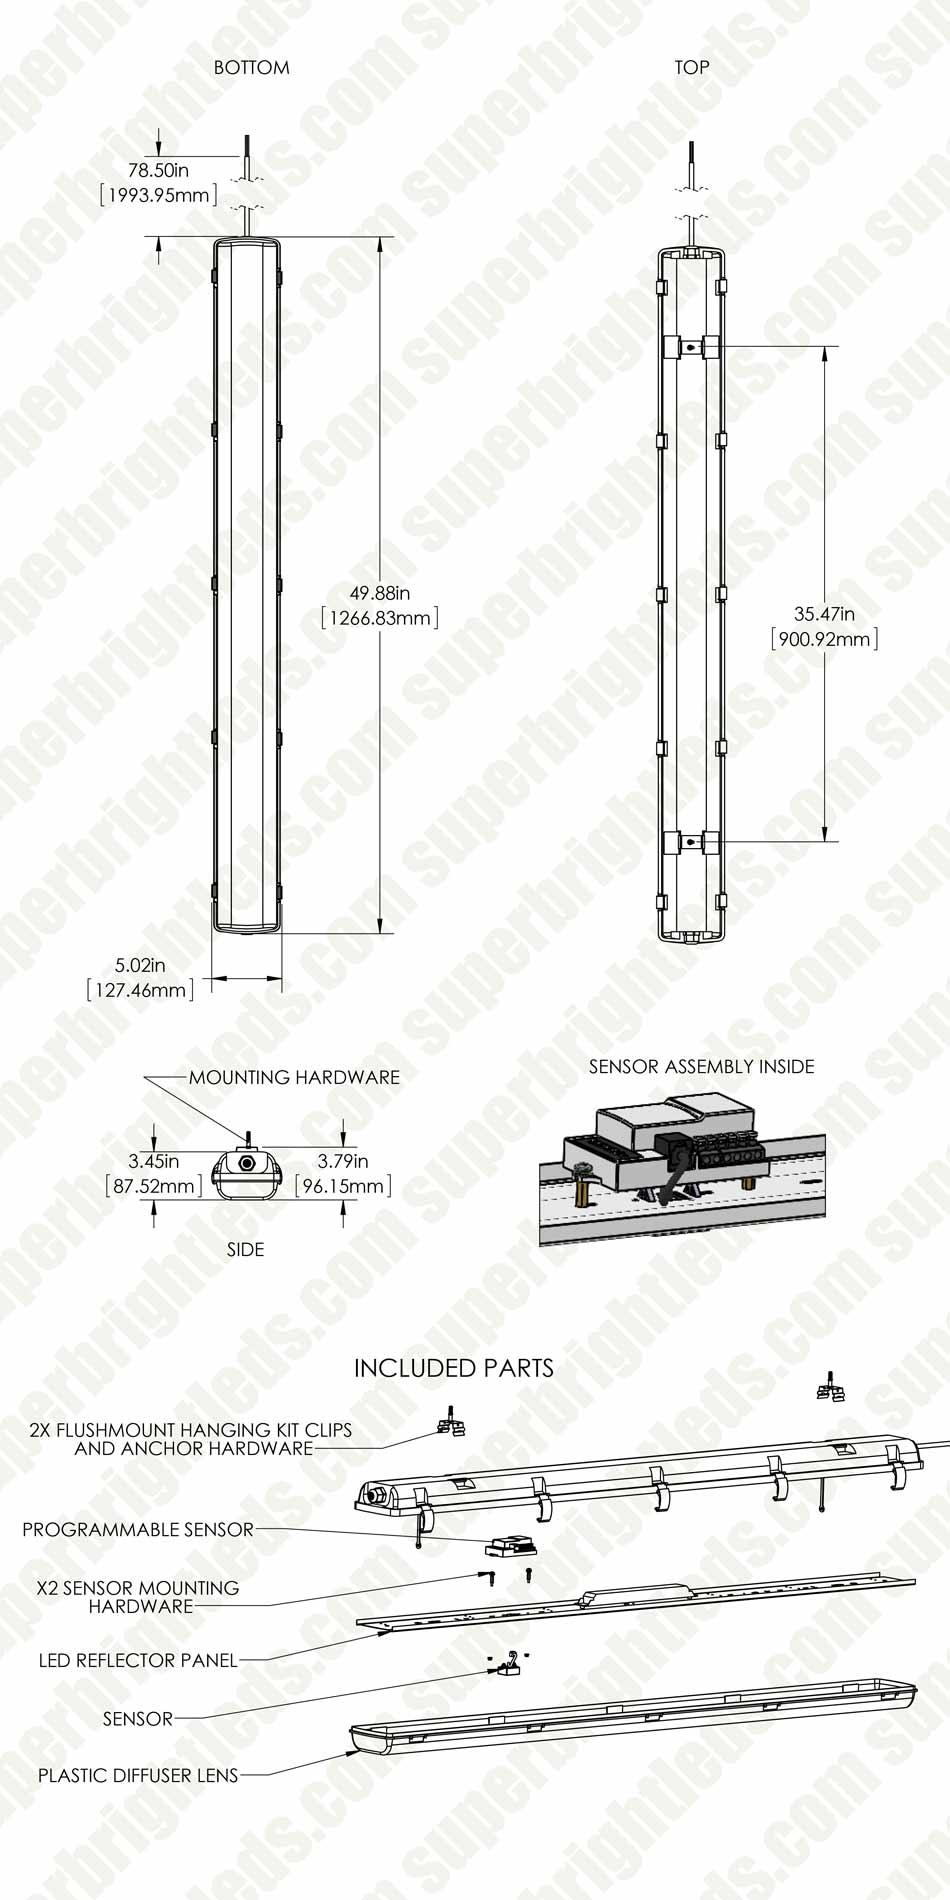 60w Vapor Tight Led Light Fixture Optional Microwave